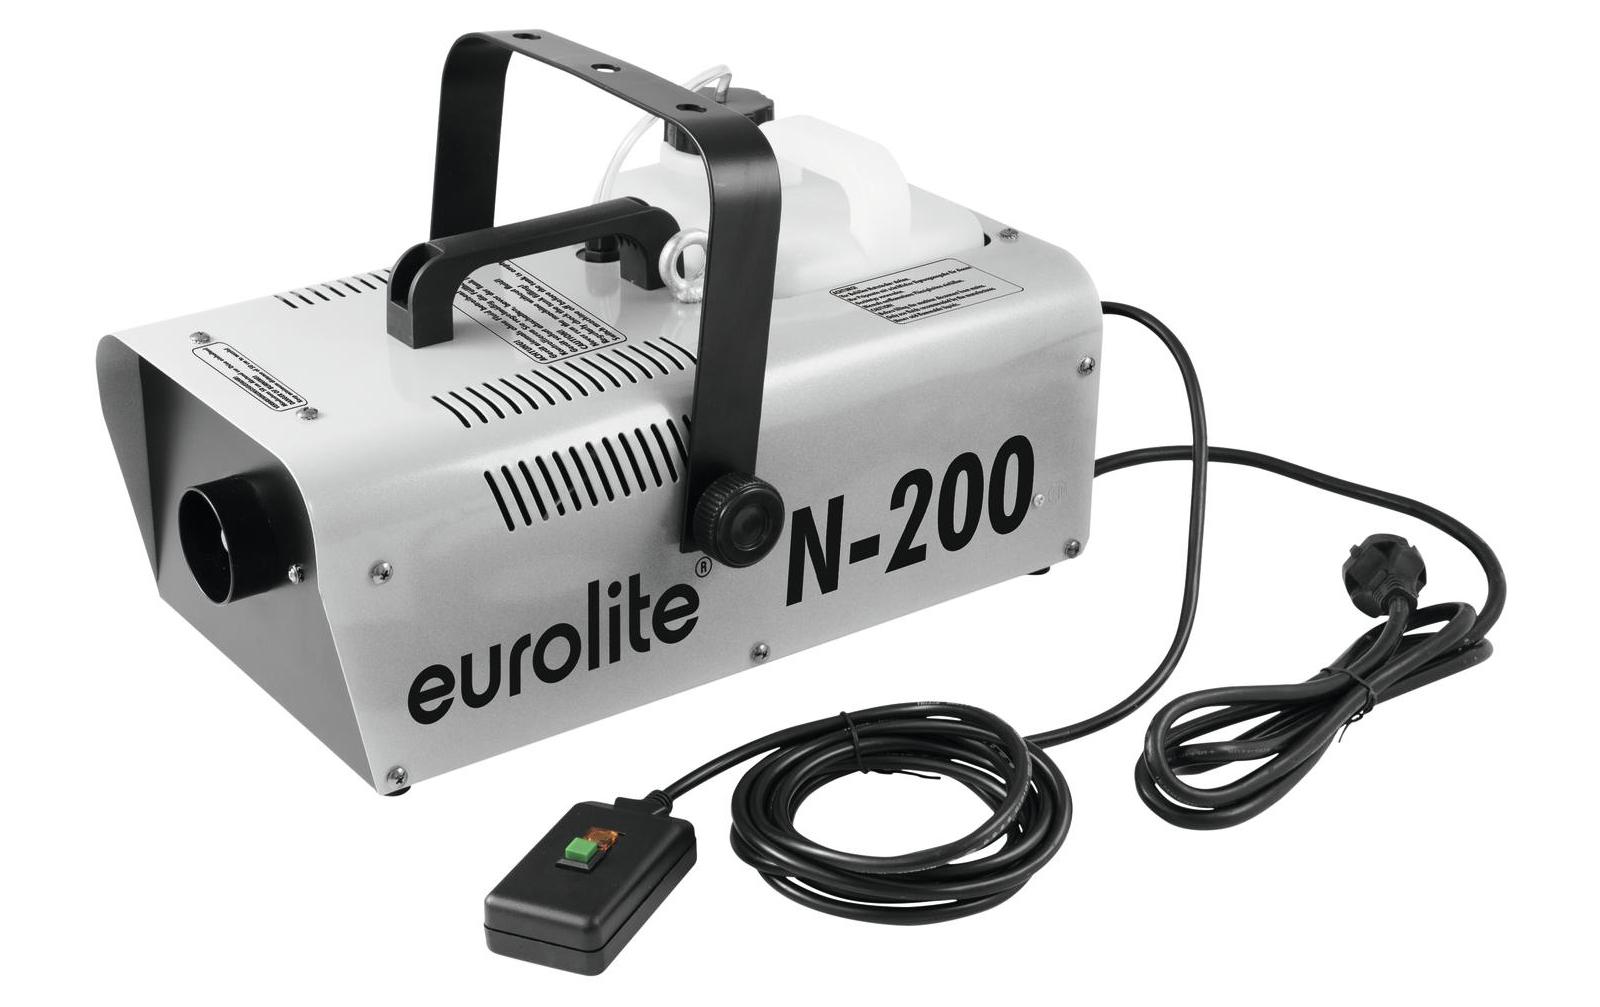 eurolite-n-200-nebelmaschine